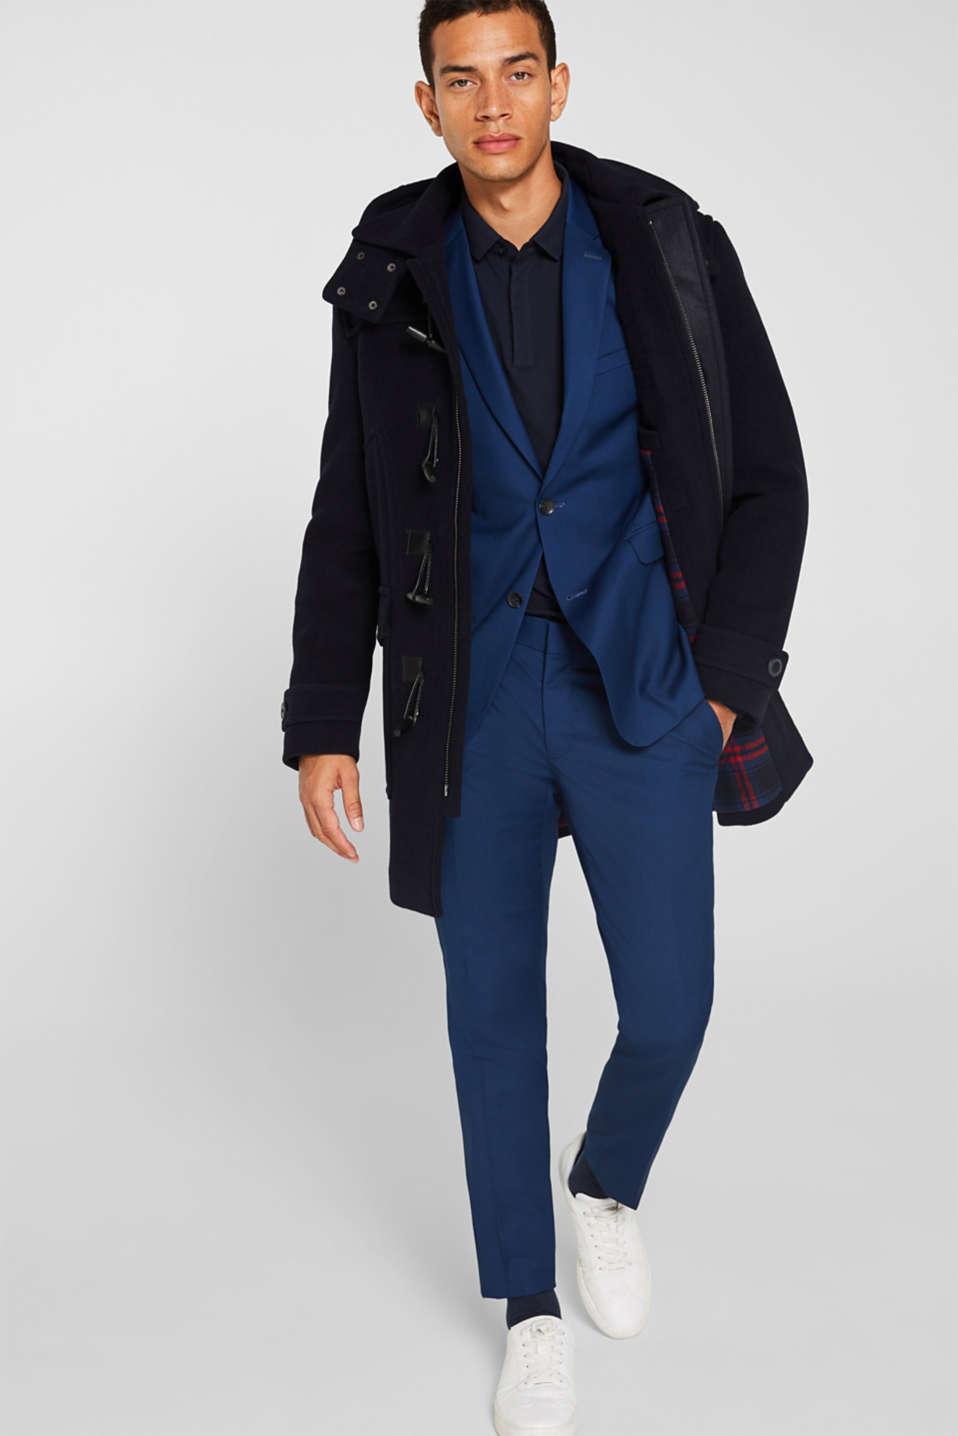 Blazers suit, BLUE, detail image number 1